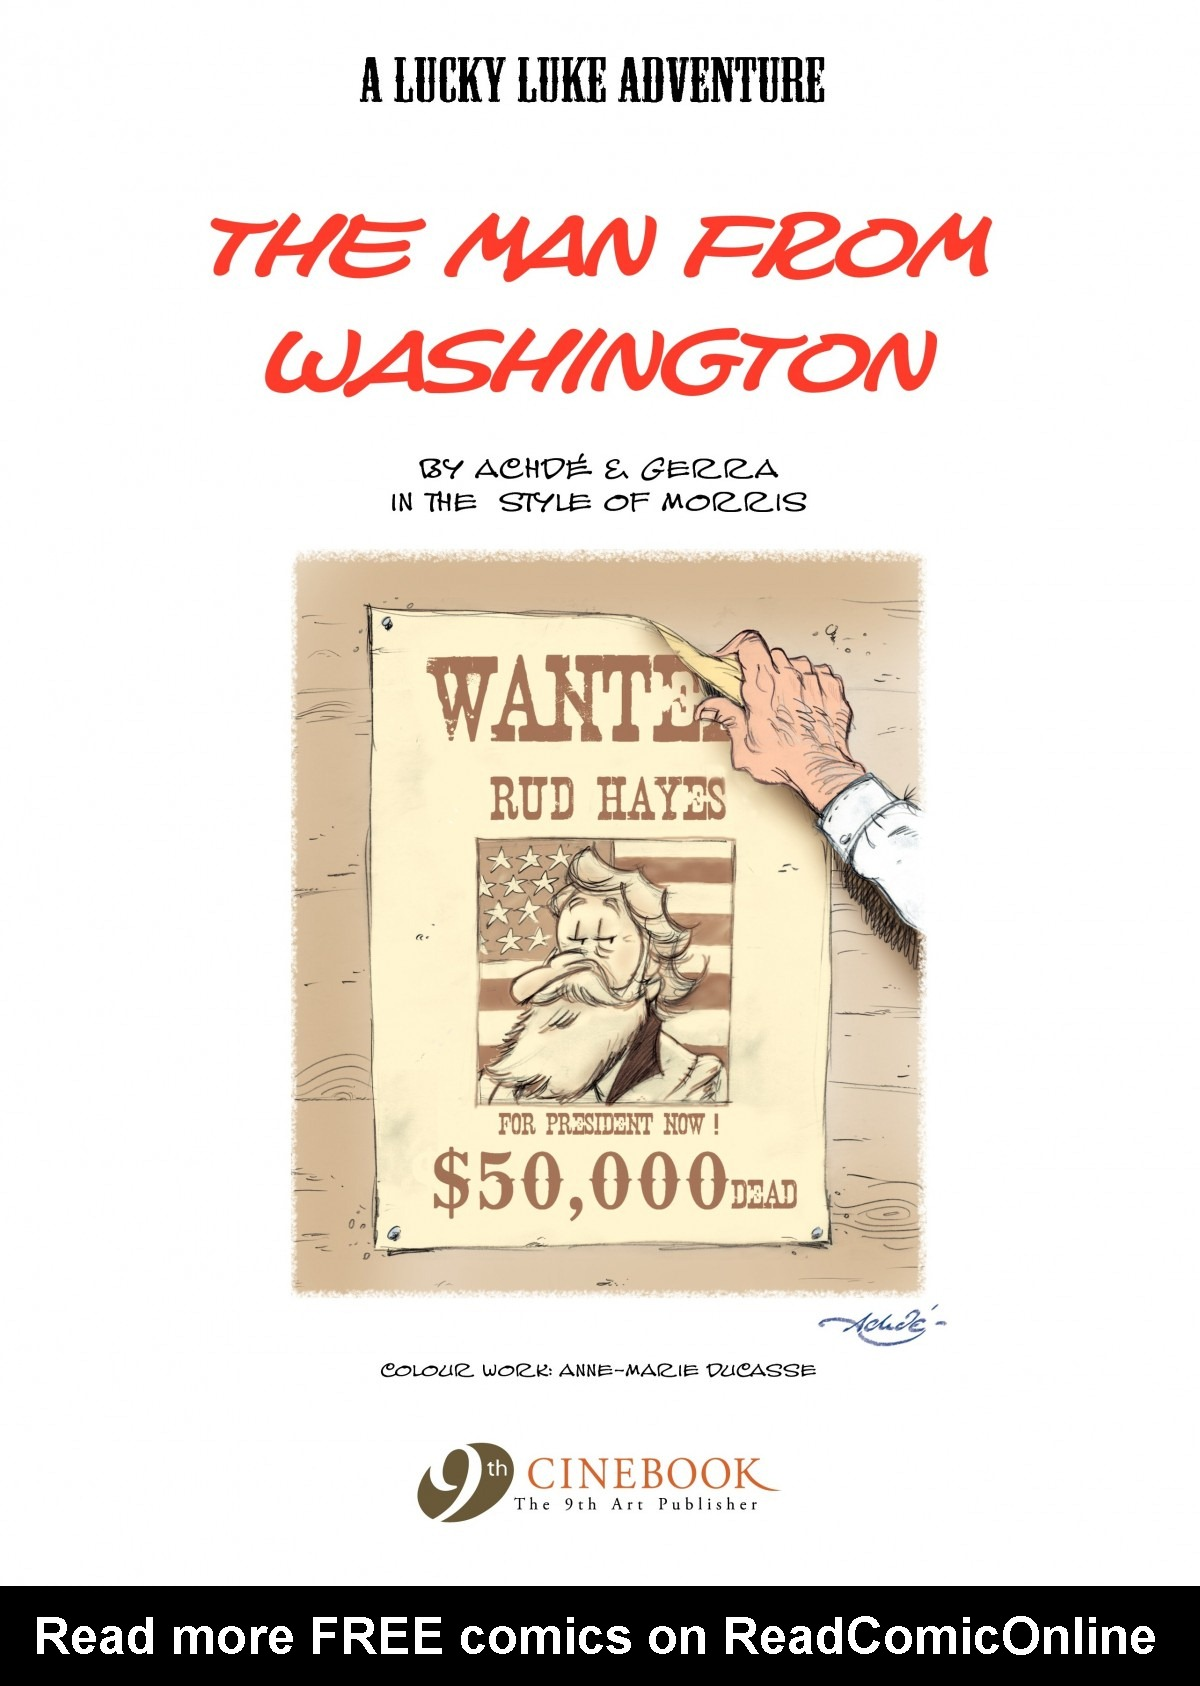 Read online A Lucky Luke Adventure comic -  Issue #39 - 2